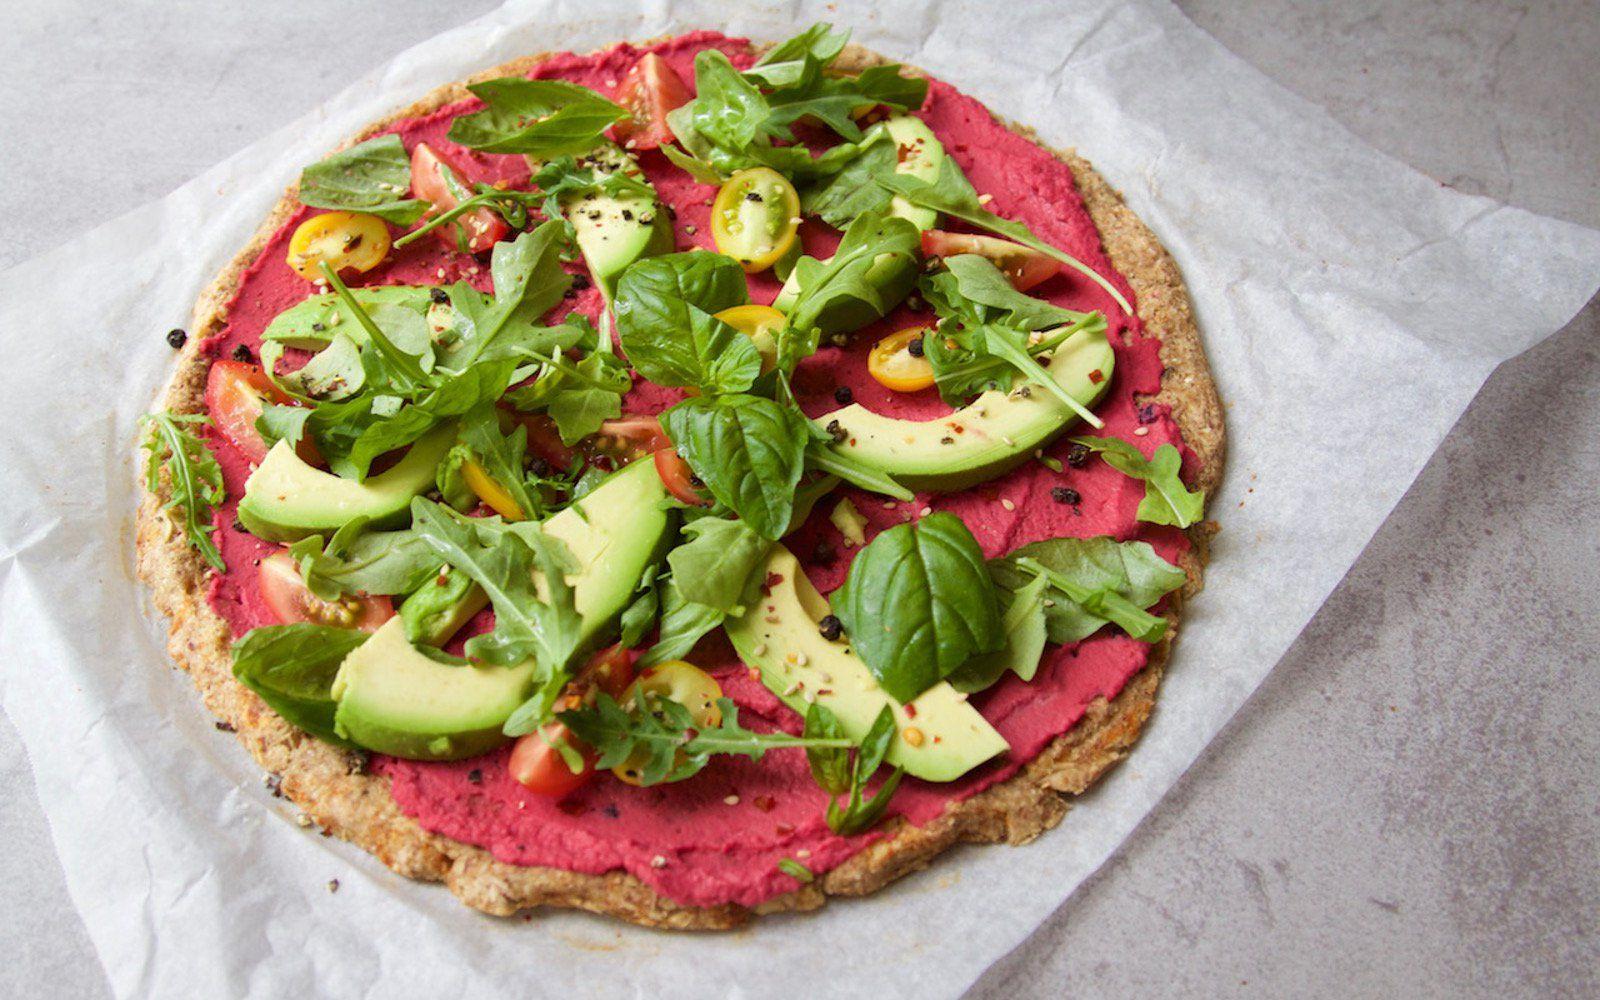 15 detoxifying whole food vegan recipes that are flavorful and 15 detoxifying whole food vegan recipes that are flavorful and filling forumfinder Gallery